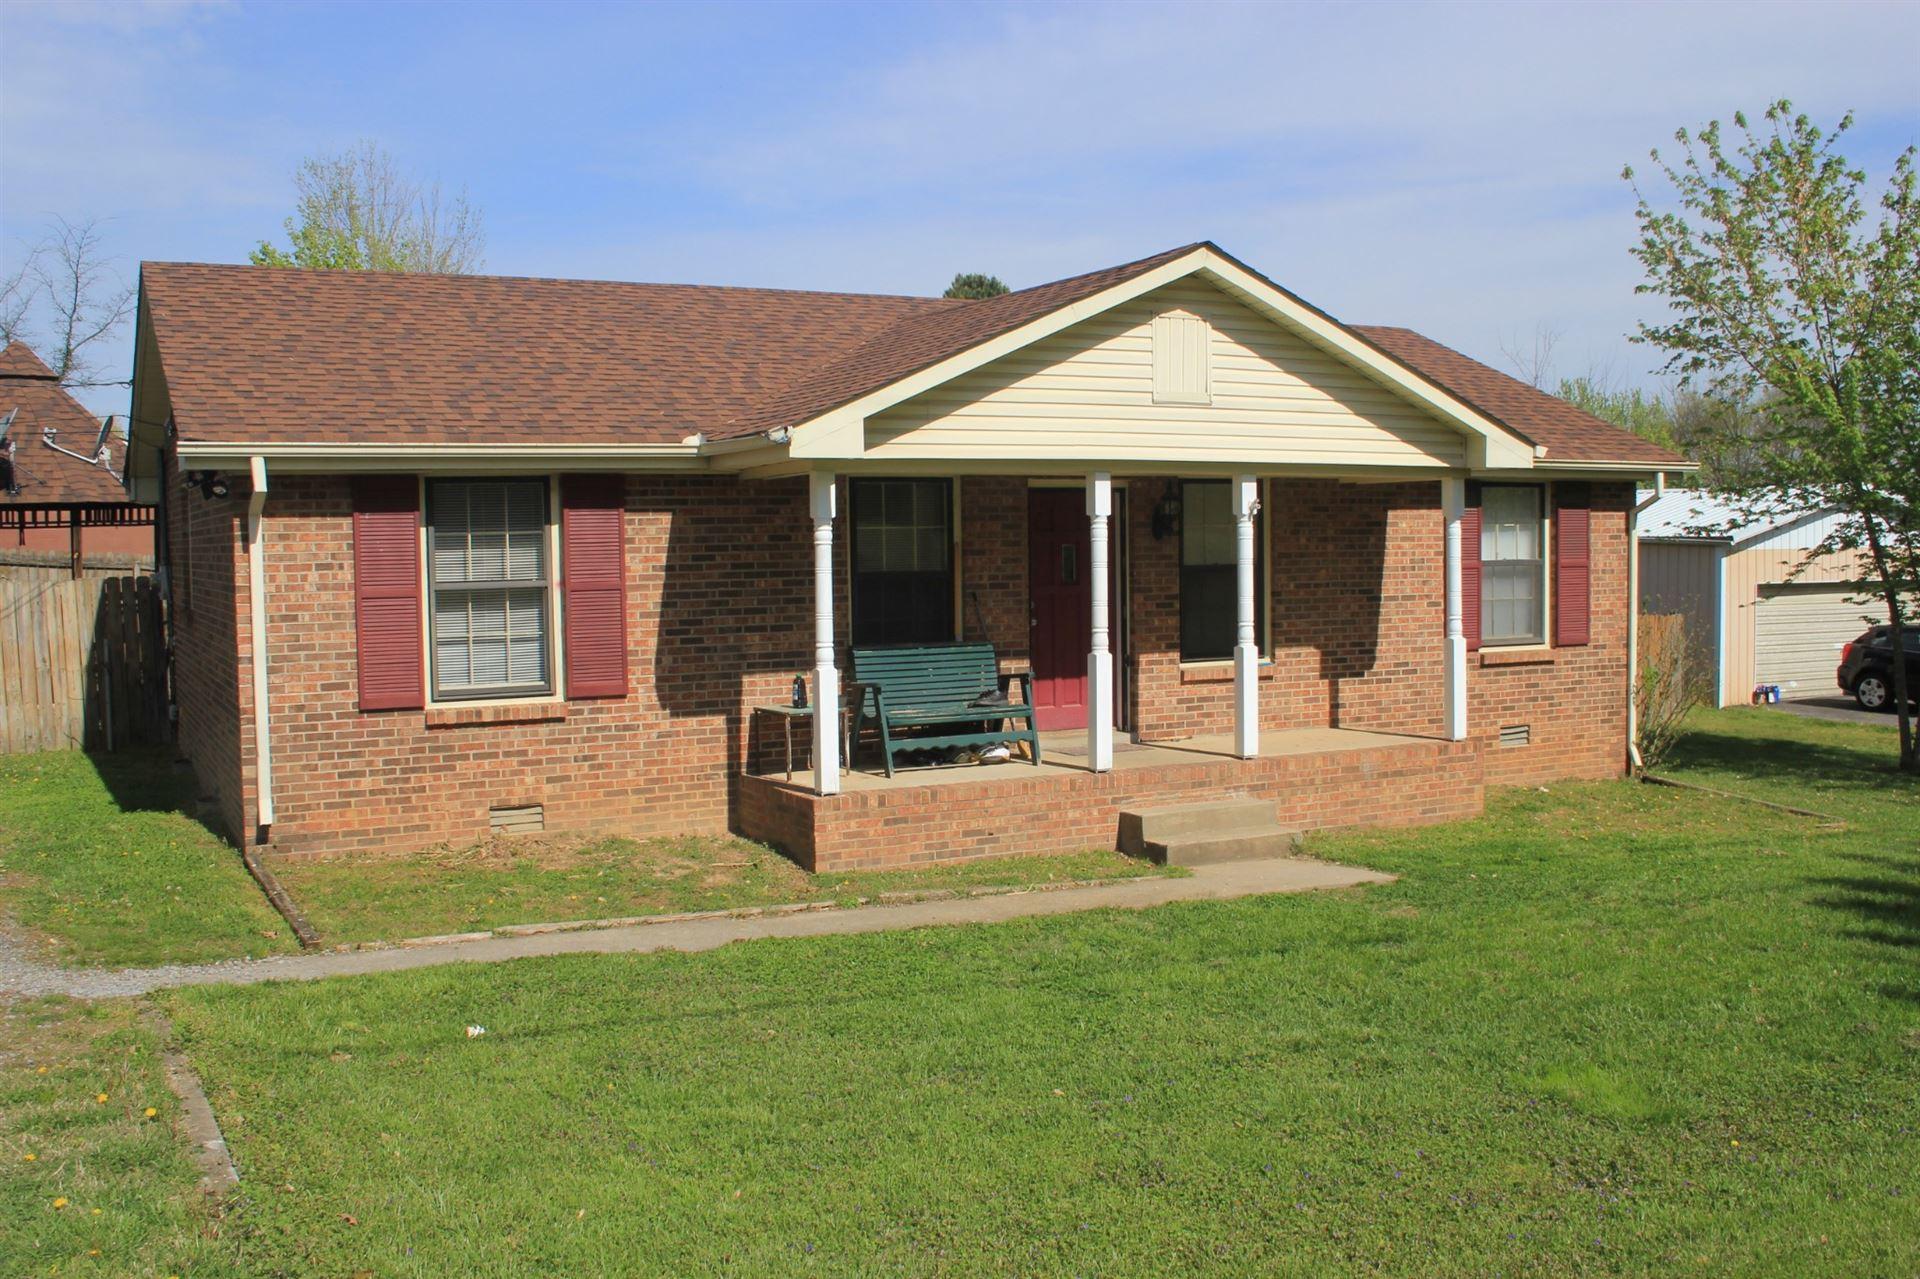 302 E Hillcrest Dr, Springfield, TN 37172 - MLS#: 2245921